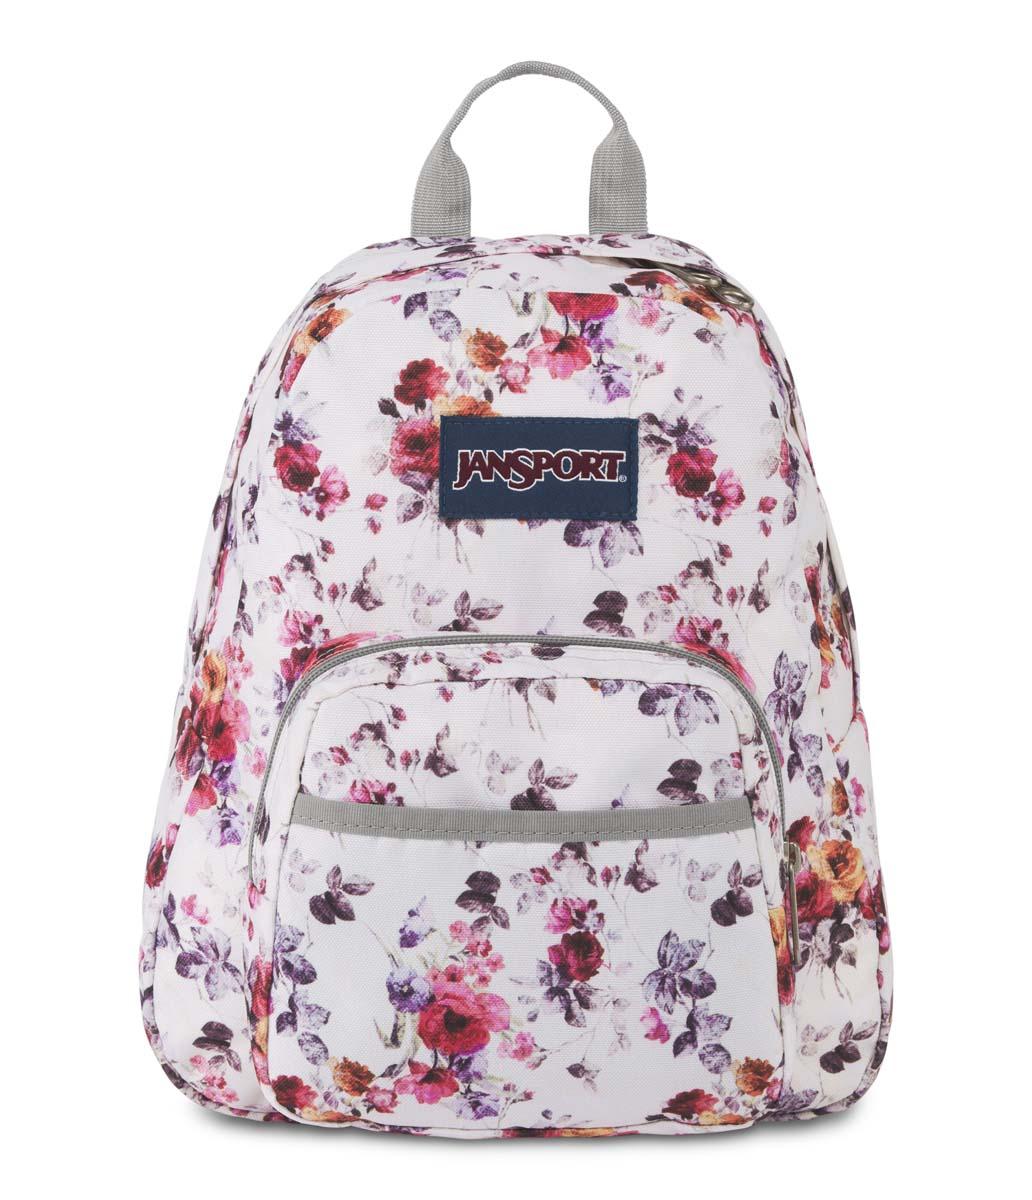 JanSport กระเป๋าเป้ รุ่น Half Pint - Floral Memory